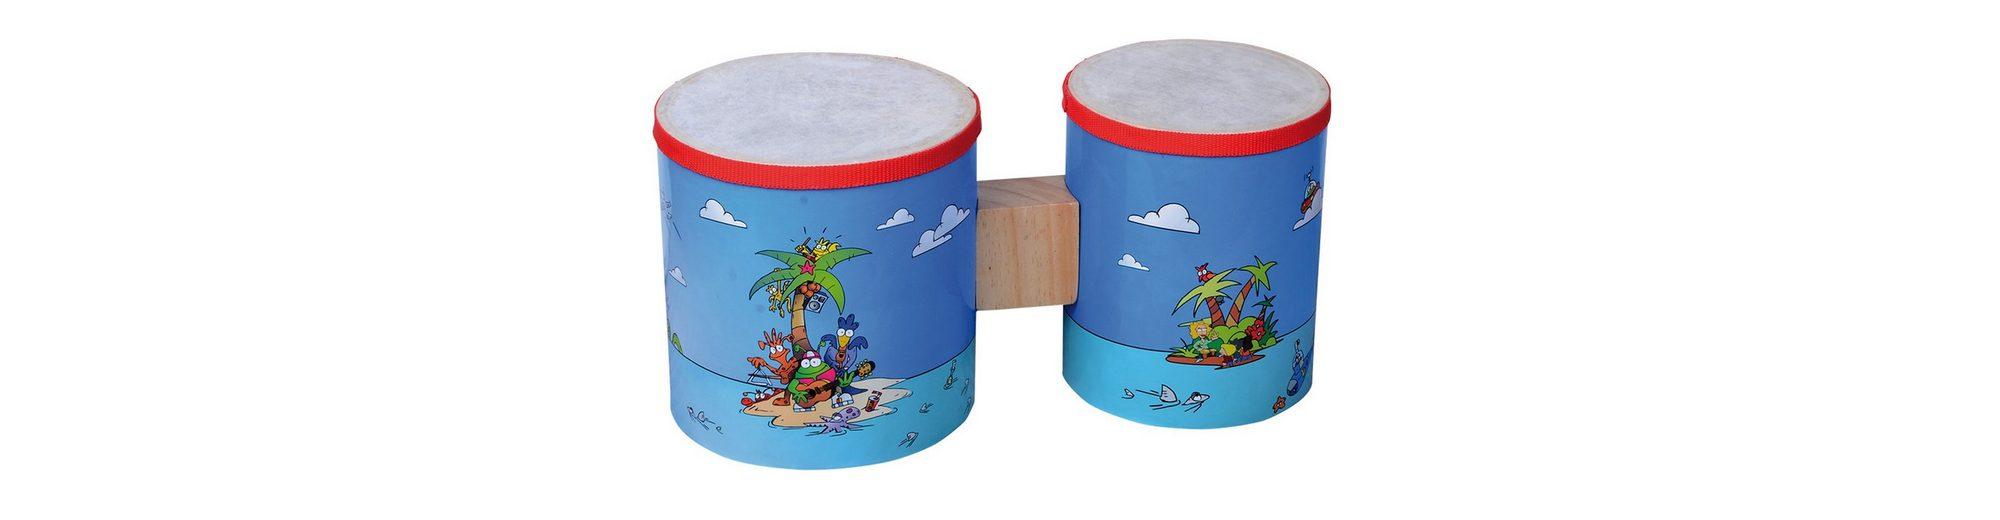 Kinder-Trommel, »Voggy's Bongos«, Voggenreiter